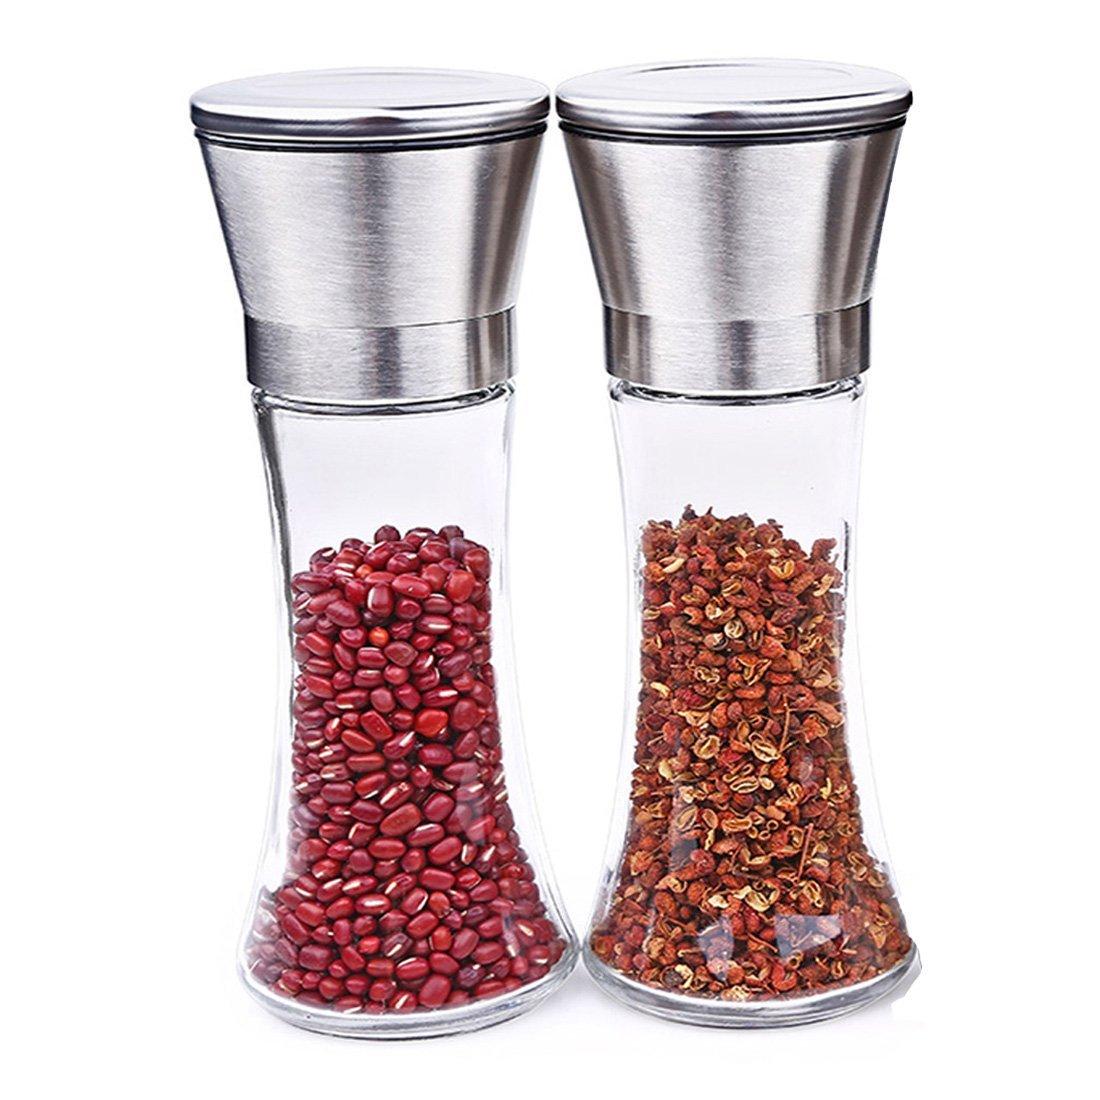 Kihappy Premium Stainless Steel Manual Salt and Pepper Gr...